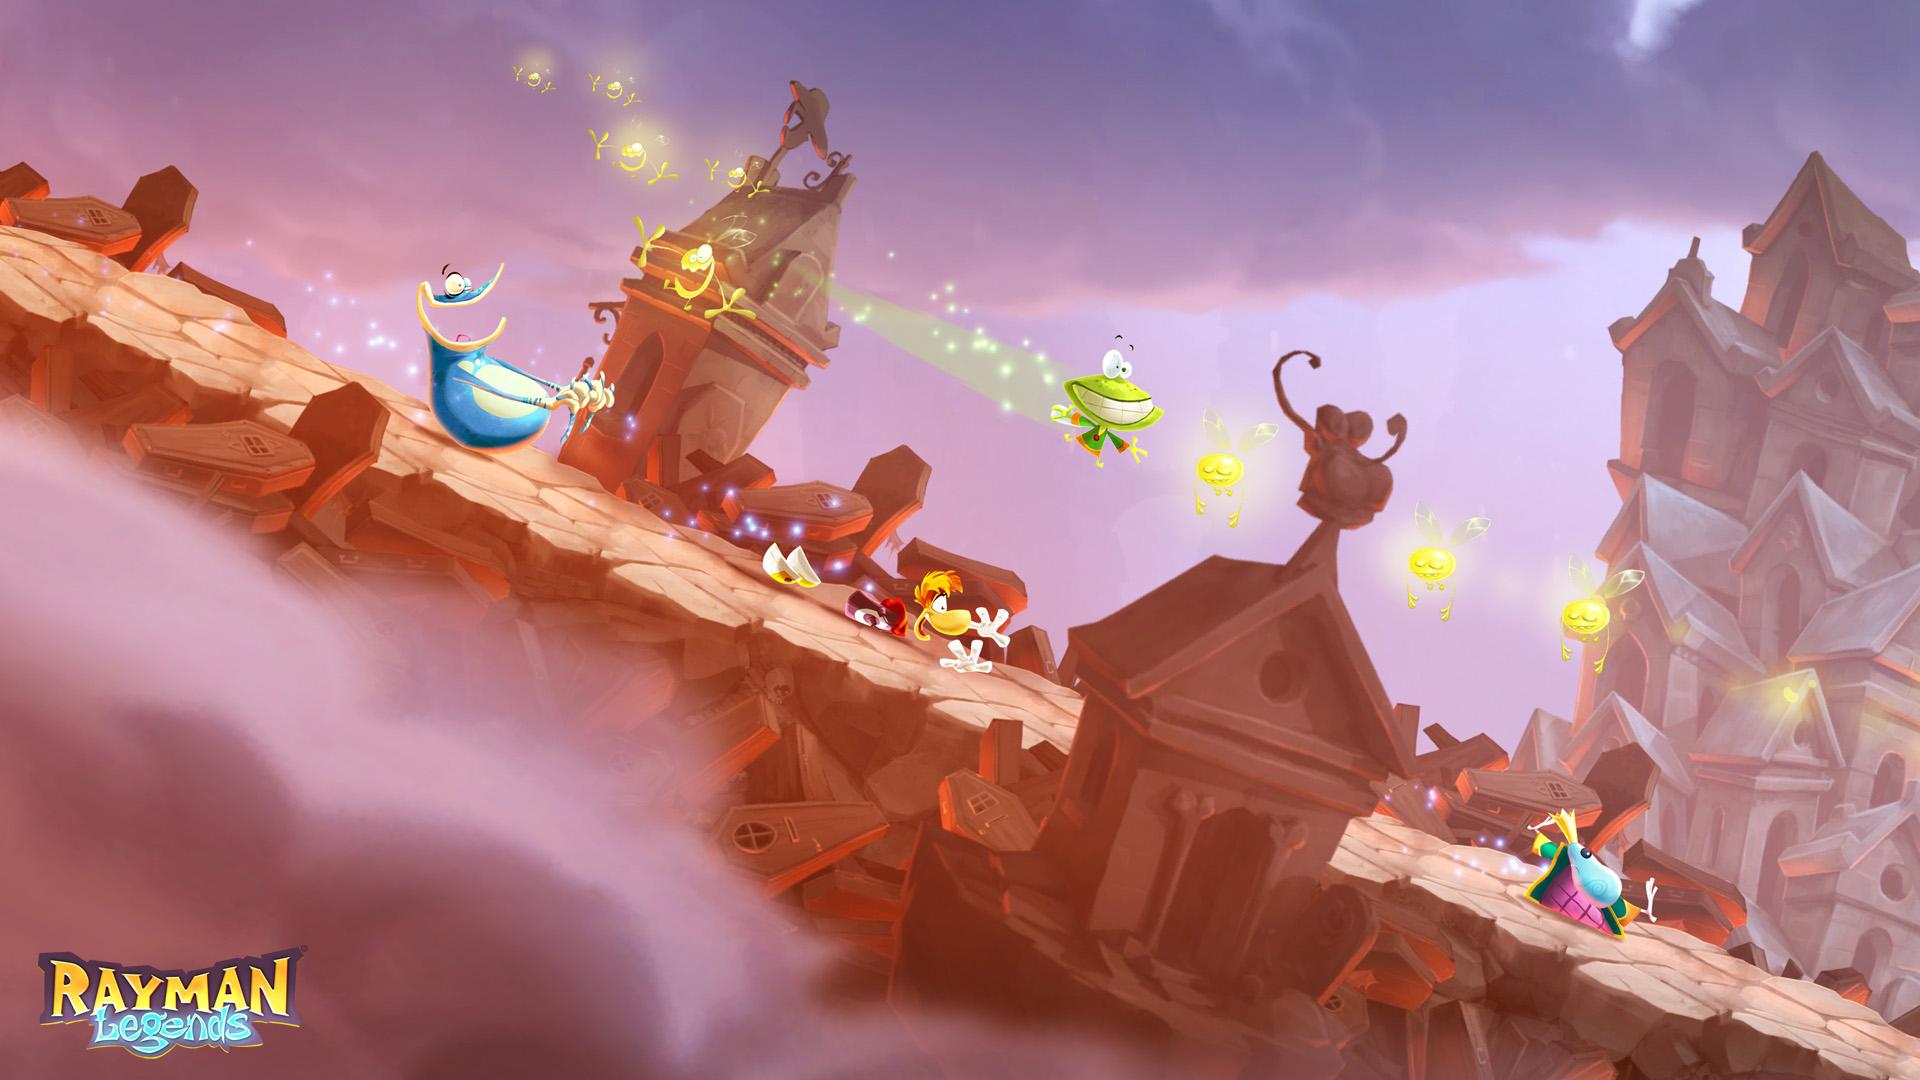 Rayman Legends Ps4 Zavvi Switch English Pal Games Sliding Down A Hill